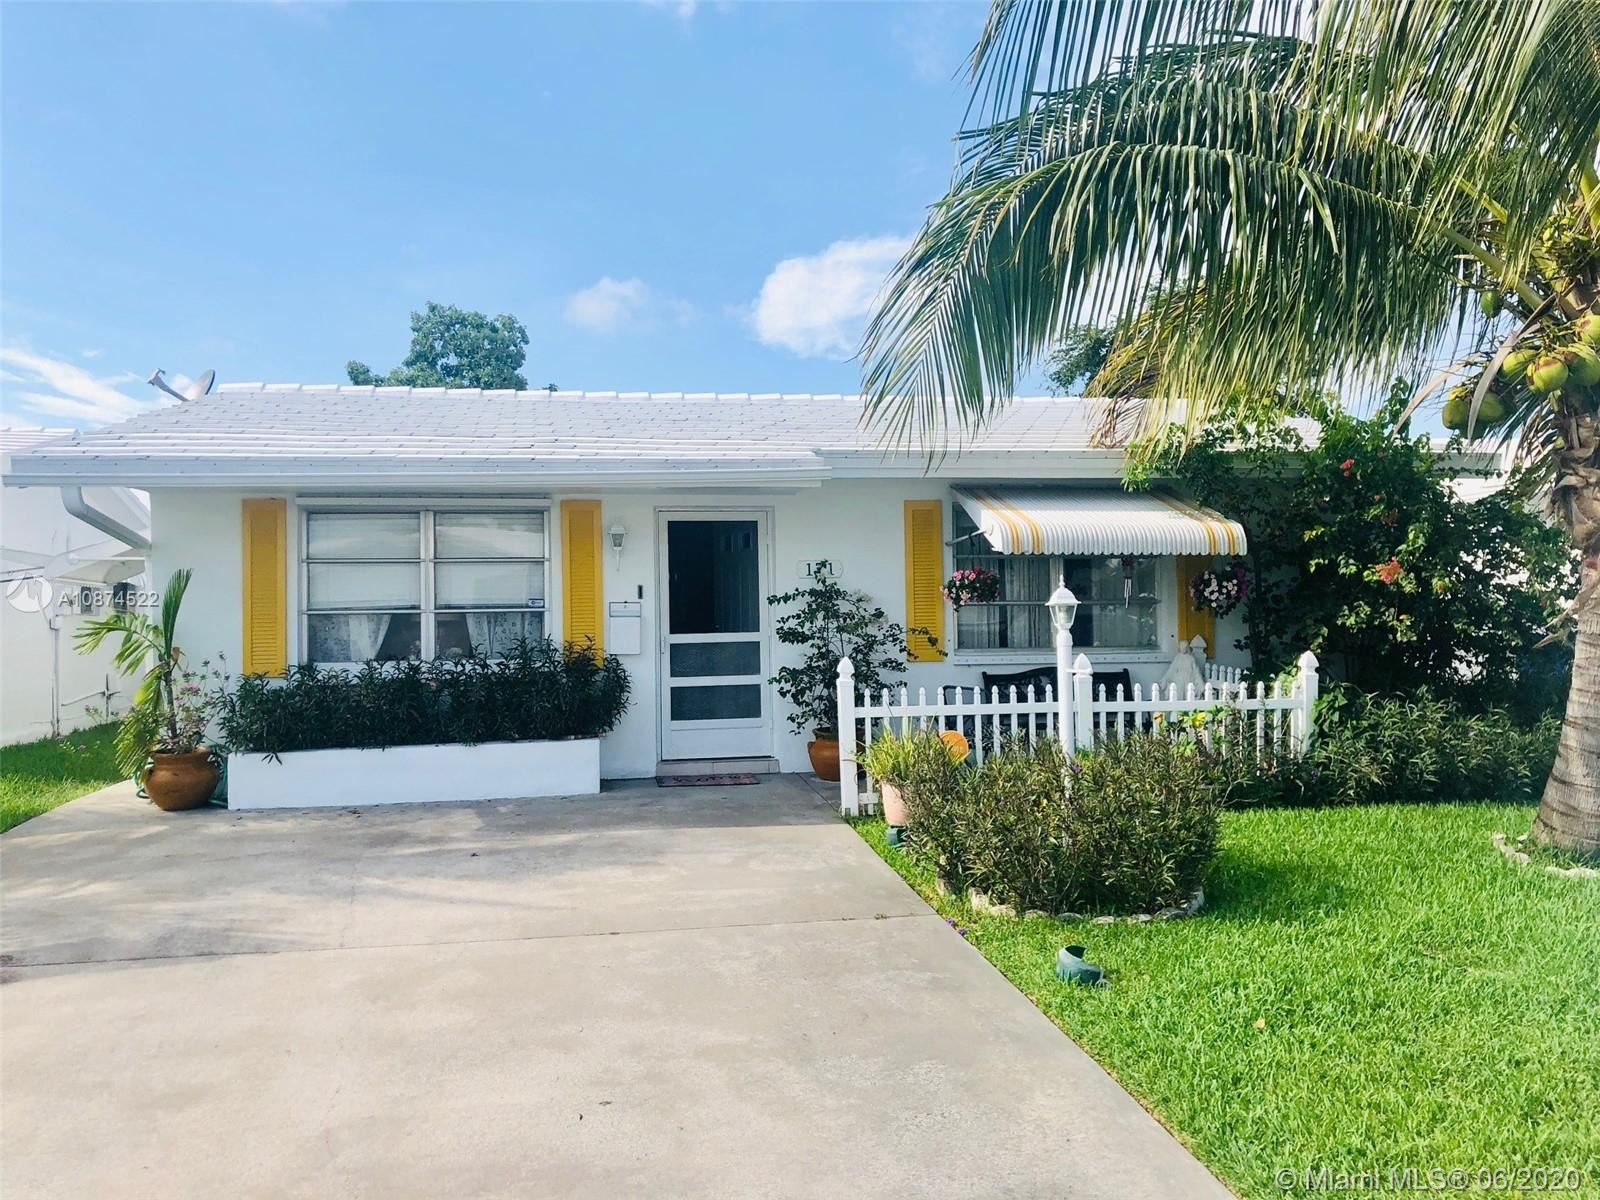 171 NW 29th Place, Pompano Beach, FL 33064 - #: A10874522